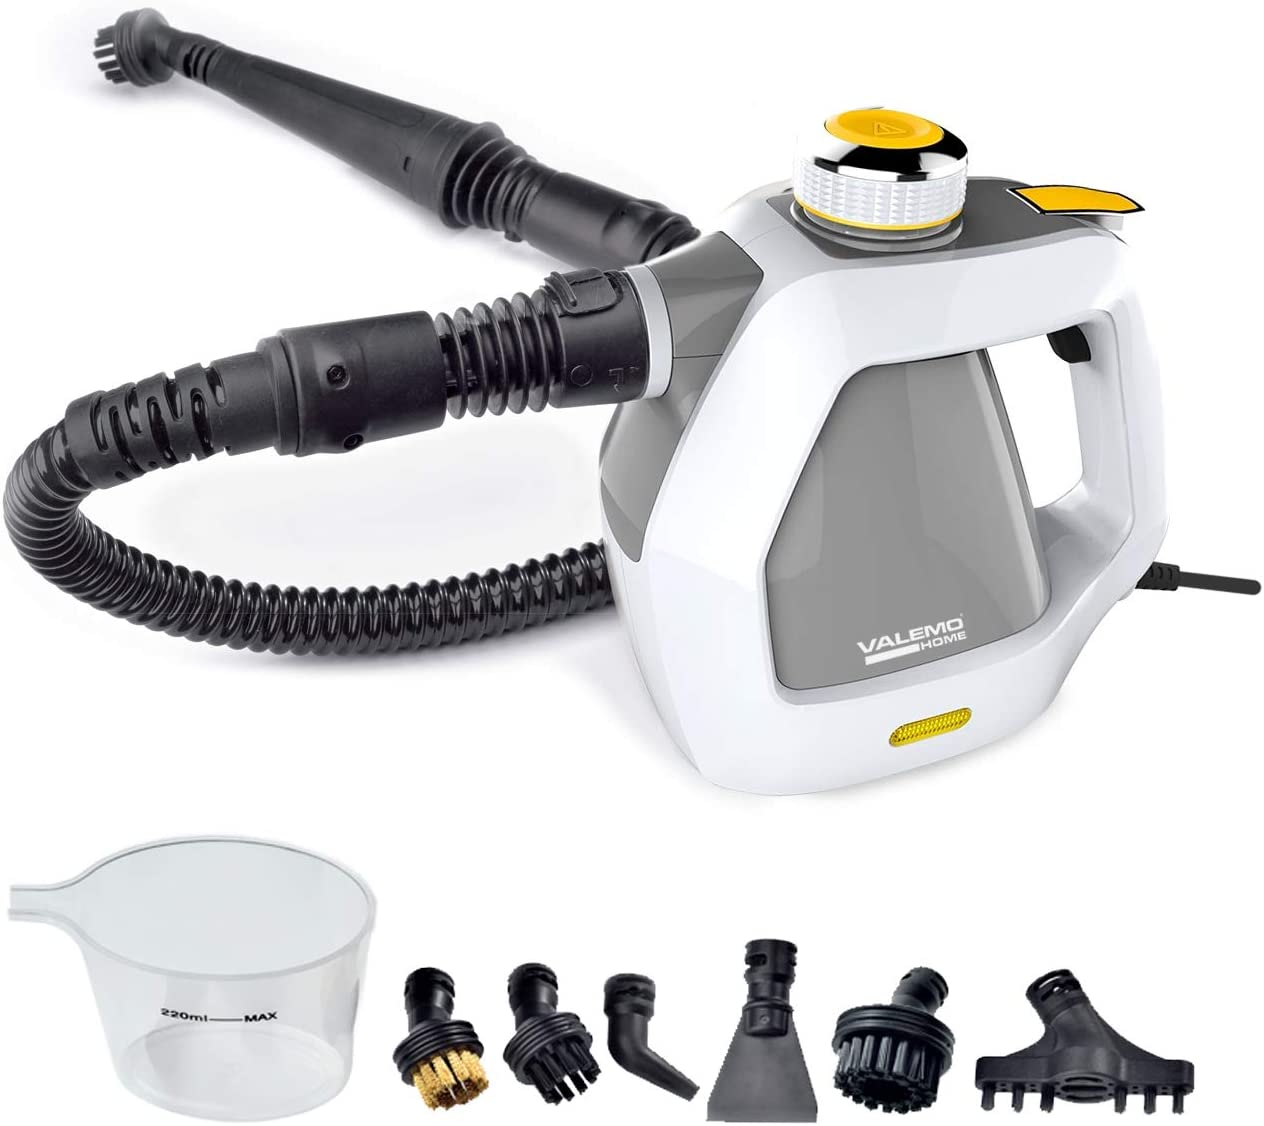 Valemo VH-ST10 Handheld Steam Cleaner and Multipurpose Steamer for Kitchens, Bathrooms and Cars, White